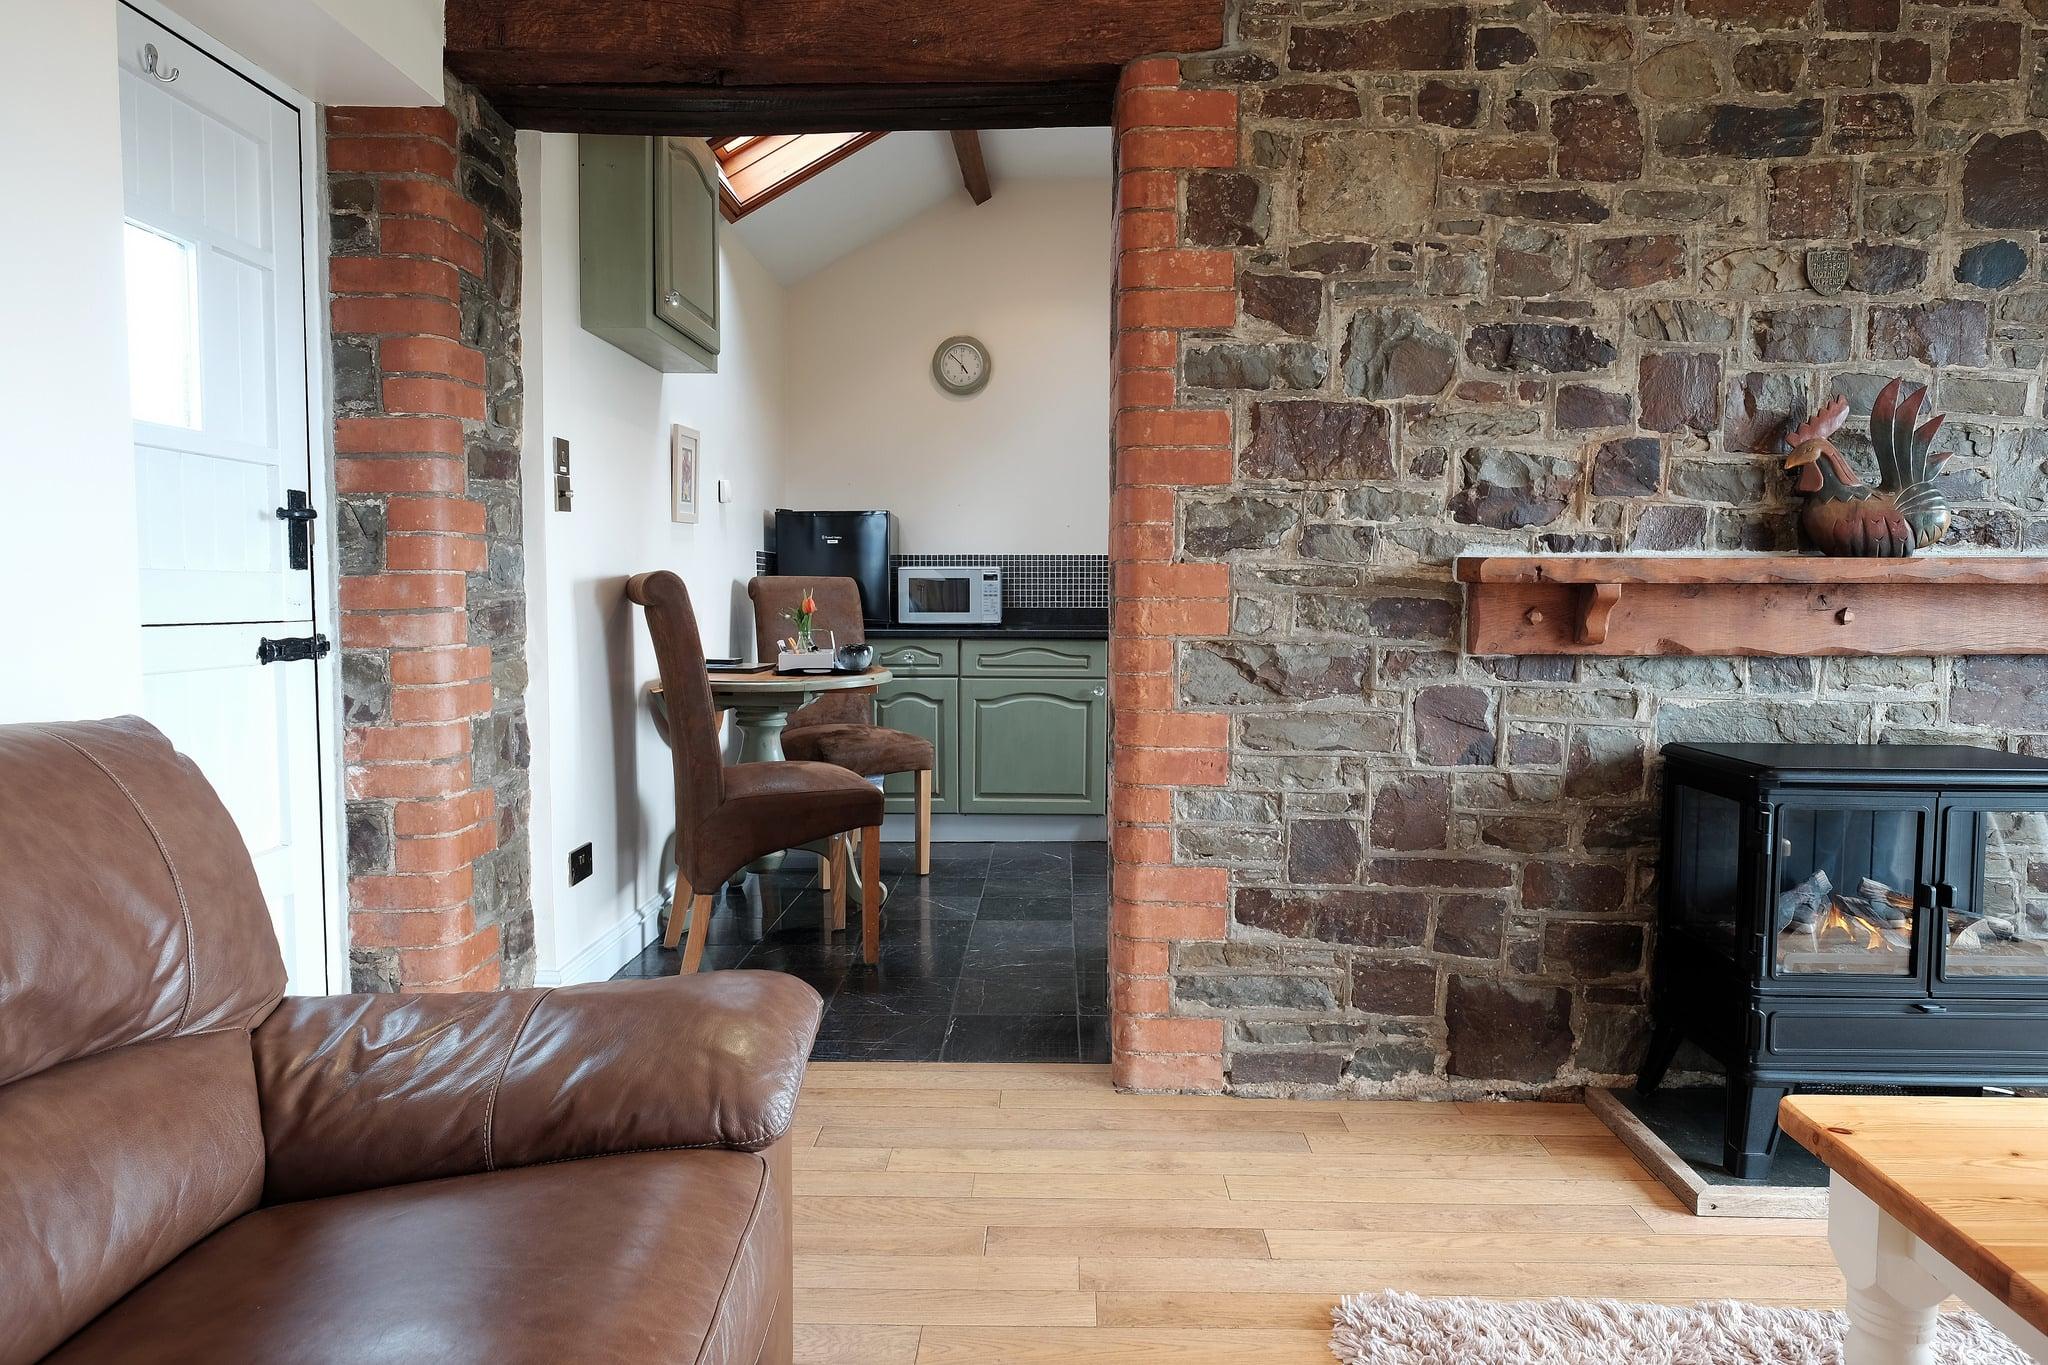 Barn conversion interior showing parts of the original stone wall